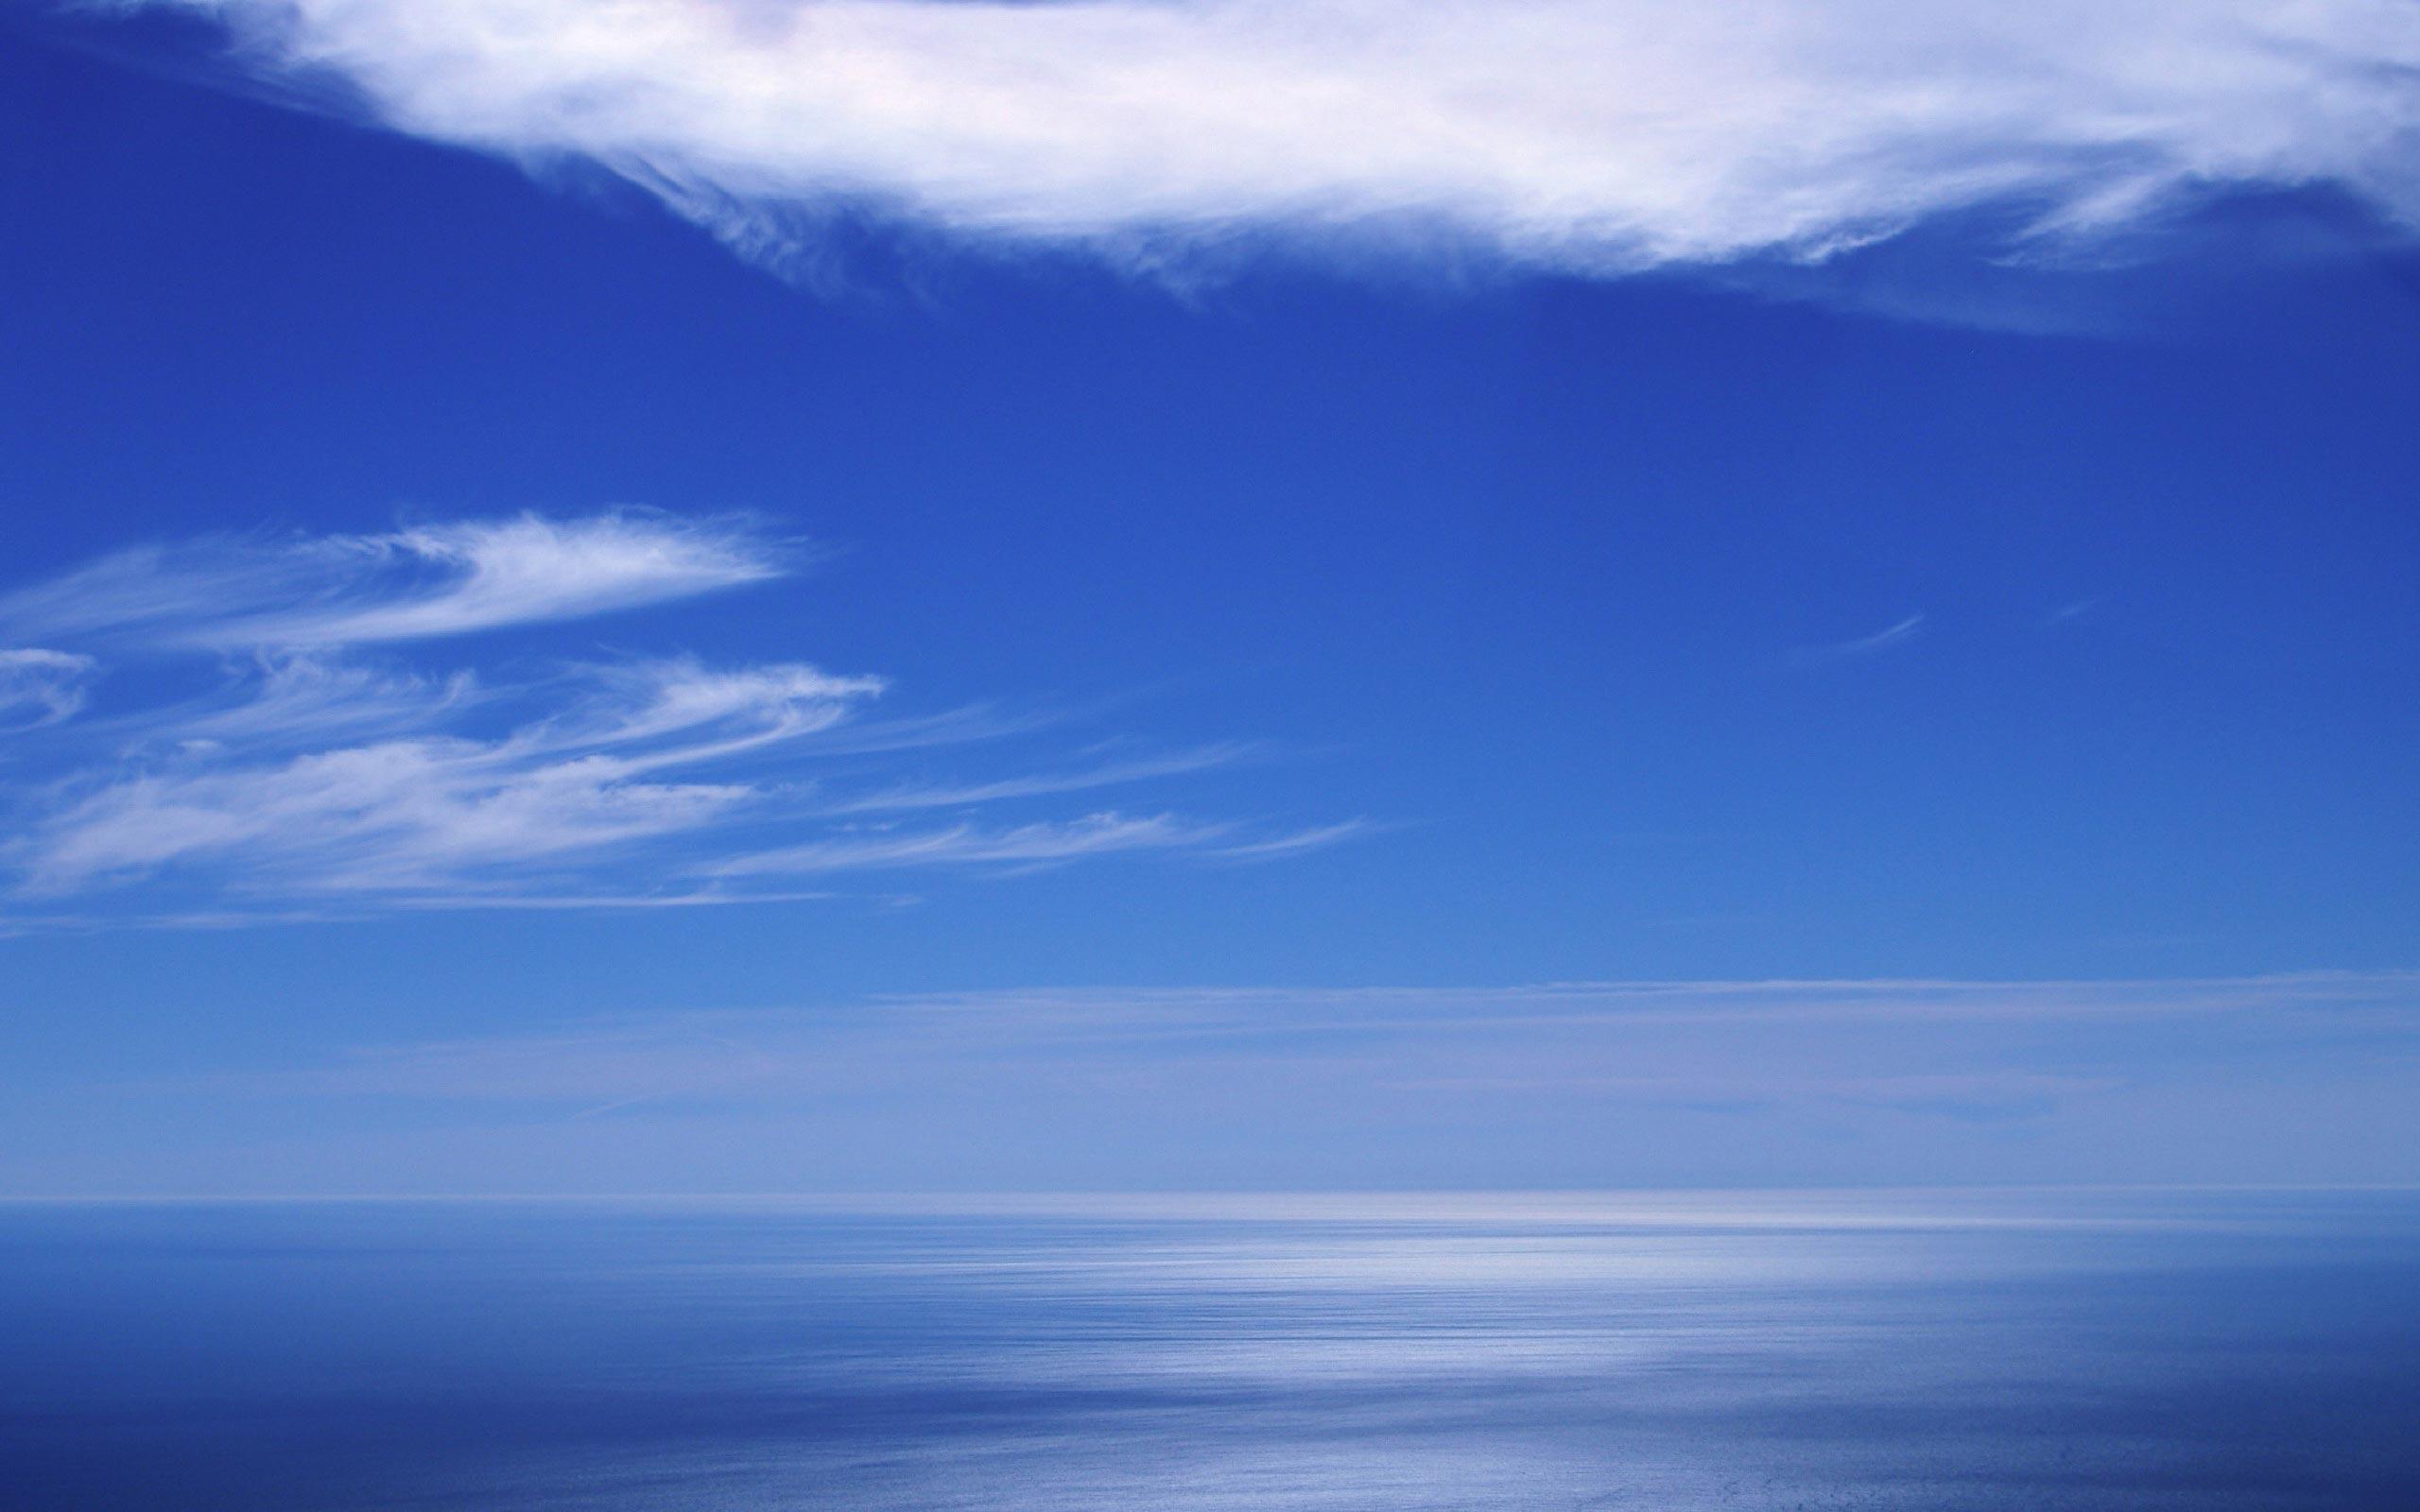 """Nebo plave boje, Der Himmel ist blau"""